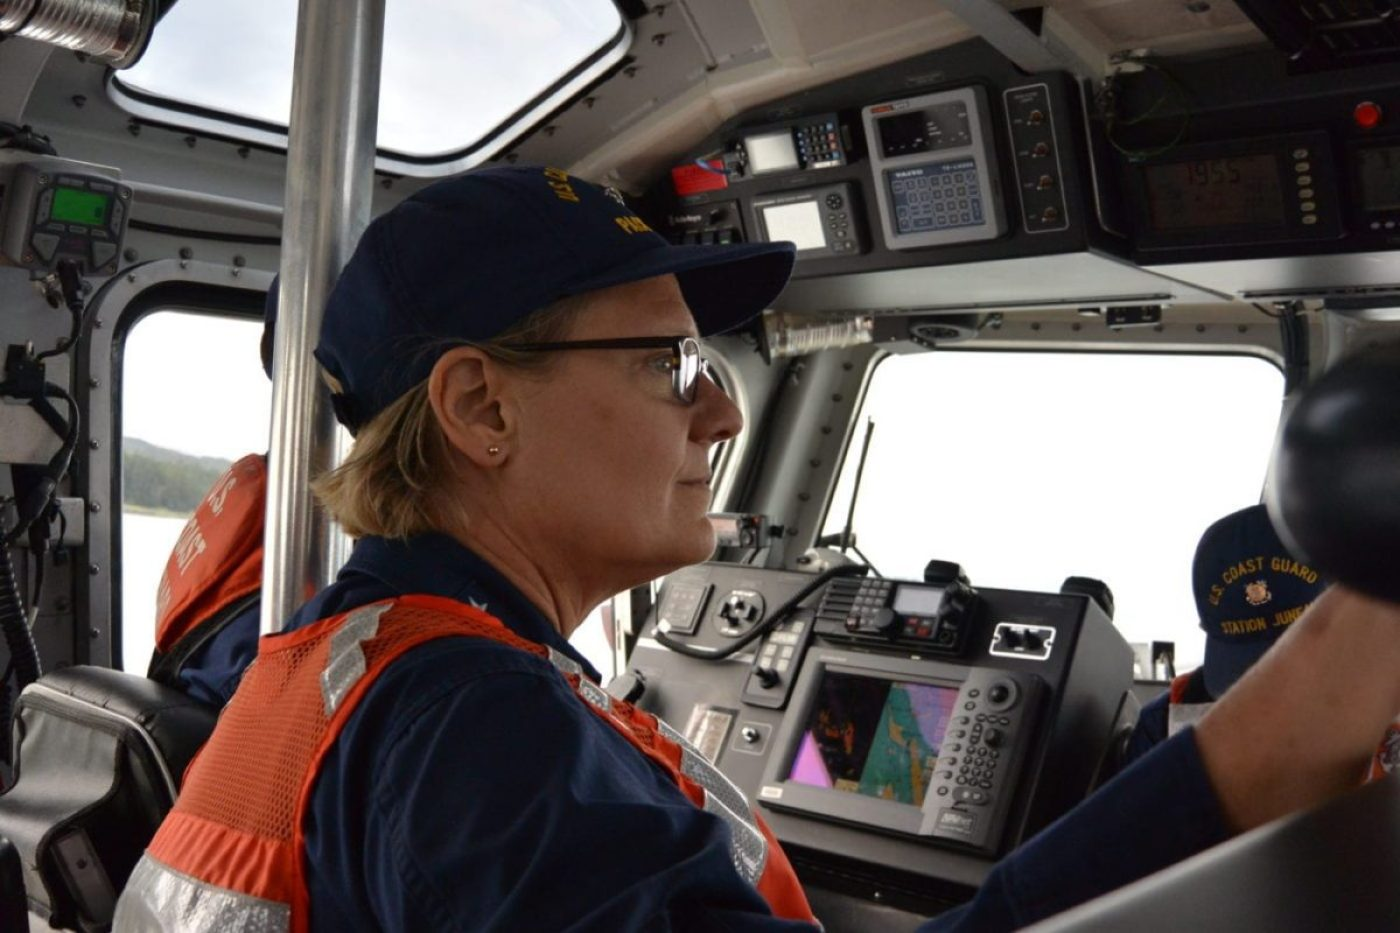 Vice Adm. Linda Fagan, Coast Guard Pacific Area commander, gets underway aboard a 45-foot Response Boat — Medium, in Auke Bay, Alaska, Aug. 15, 2018. Fagan visited multiple units in Coast Guard District Seventeen's area of responsibility. (Coast Guard photo by Seaman Nicole Bridler)